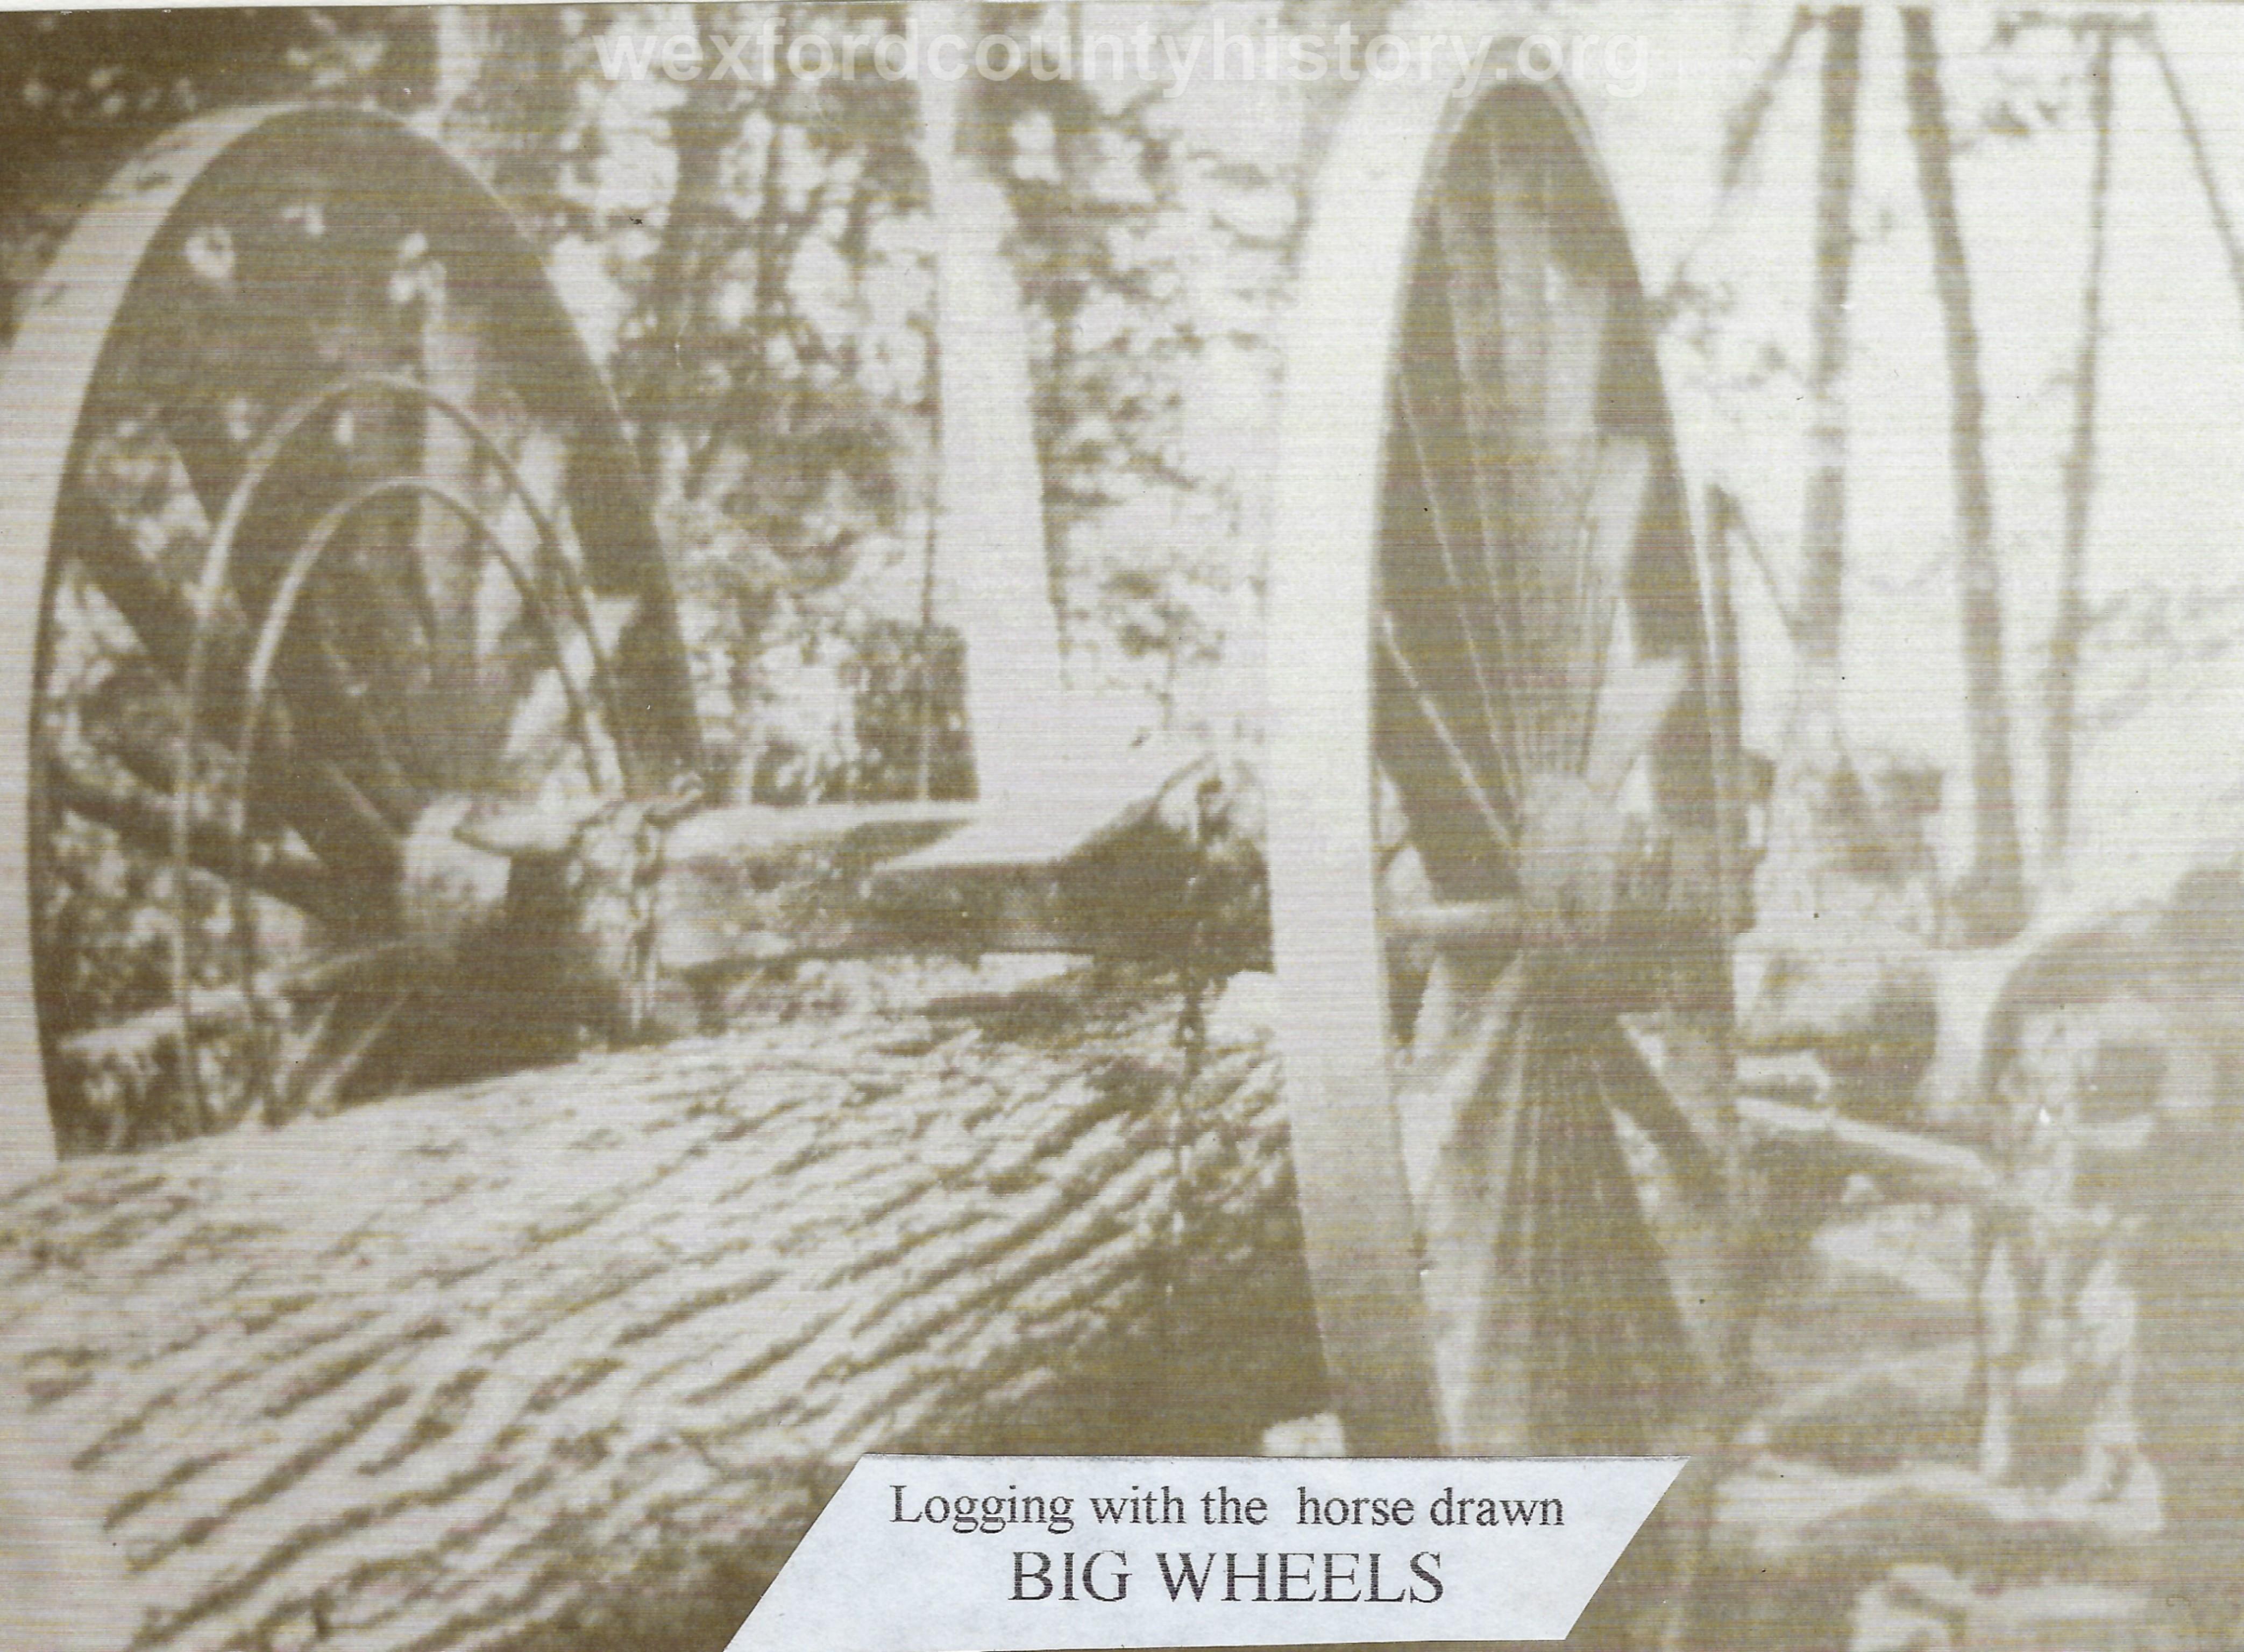 Cadillac-Lumber-Michigan-Logging-Wheels-4